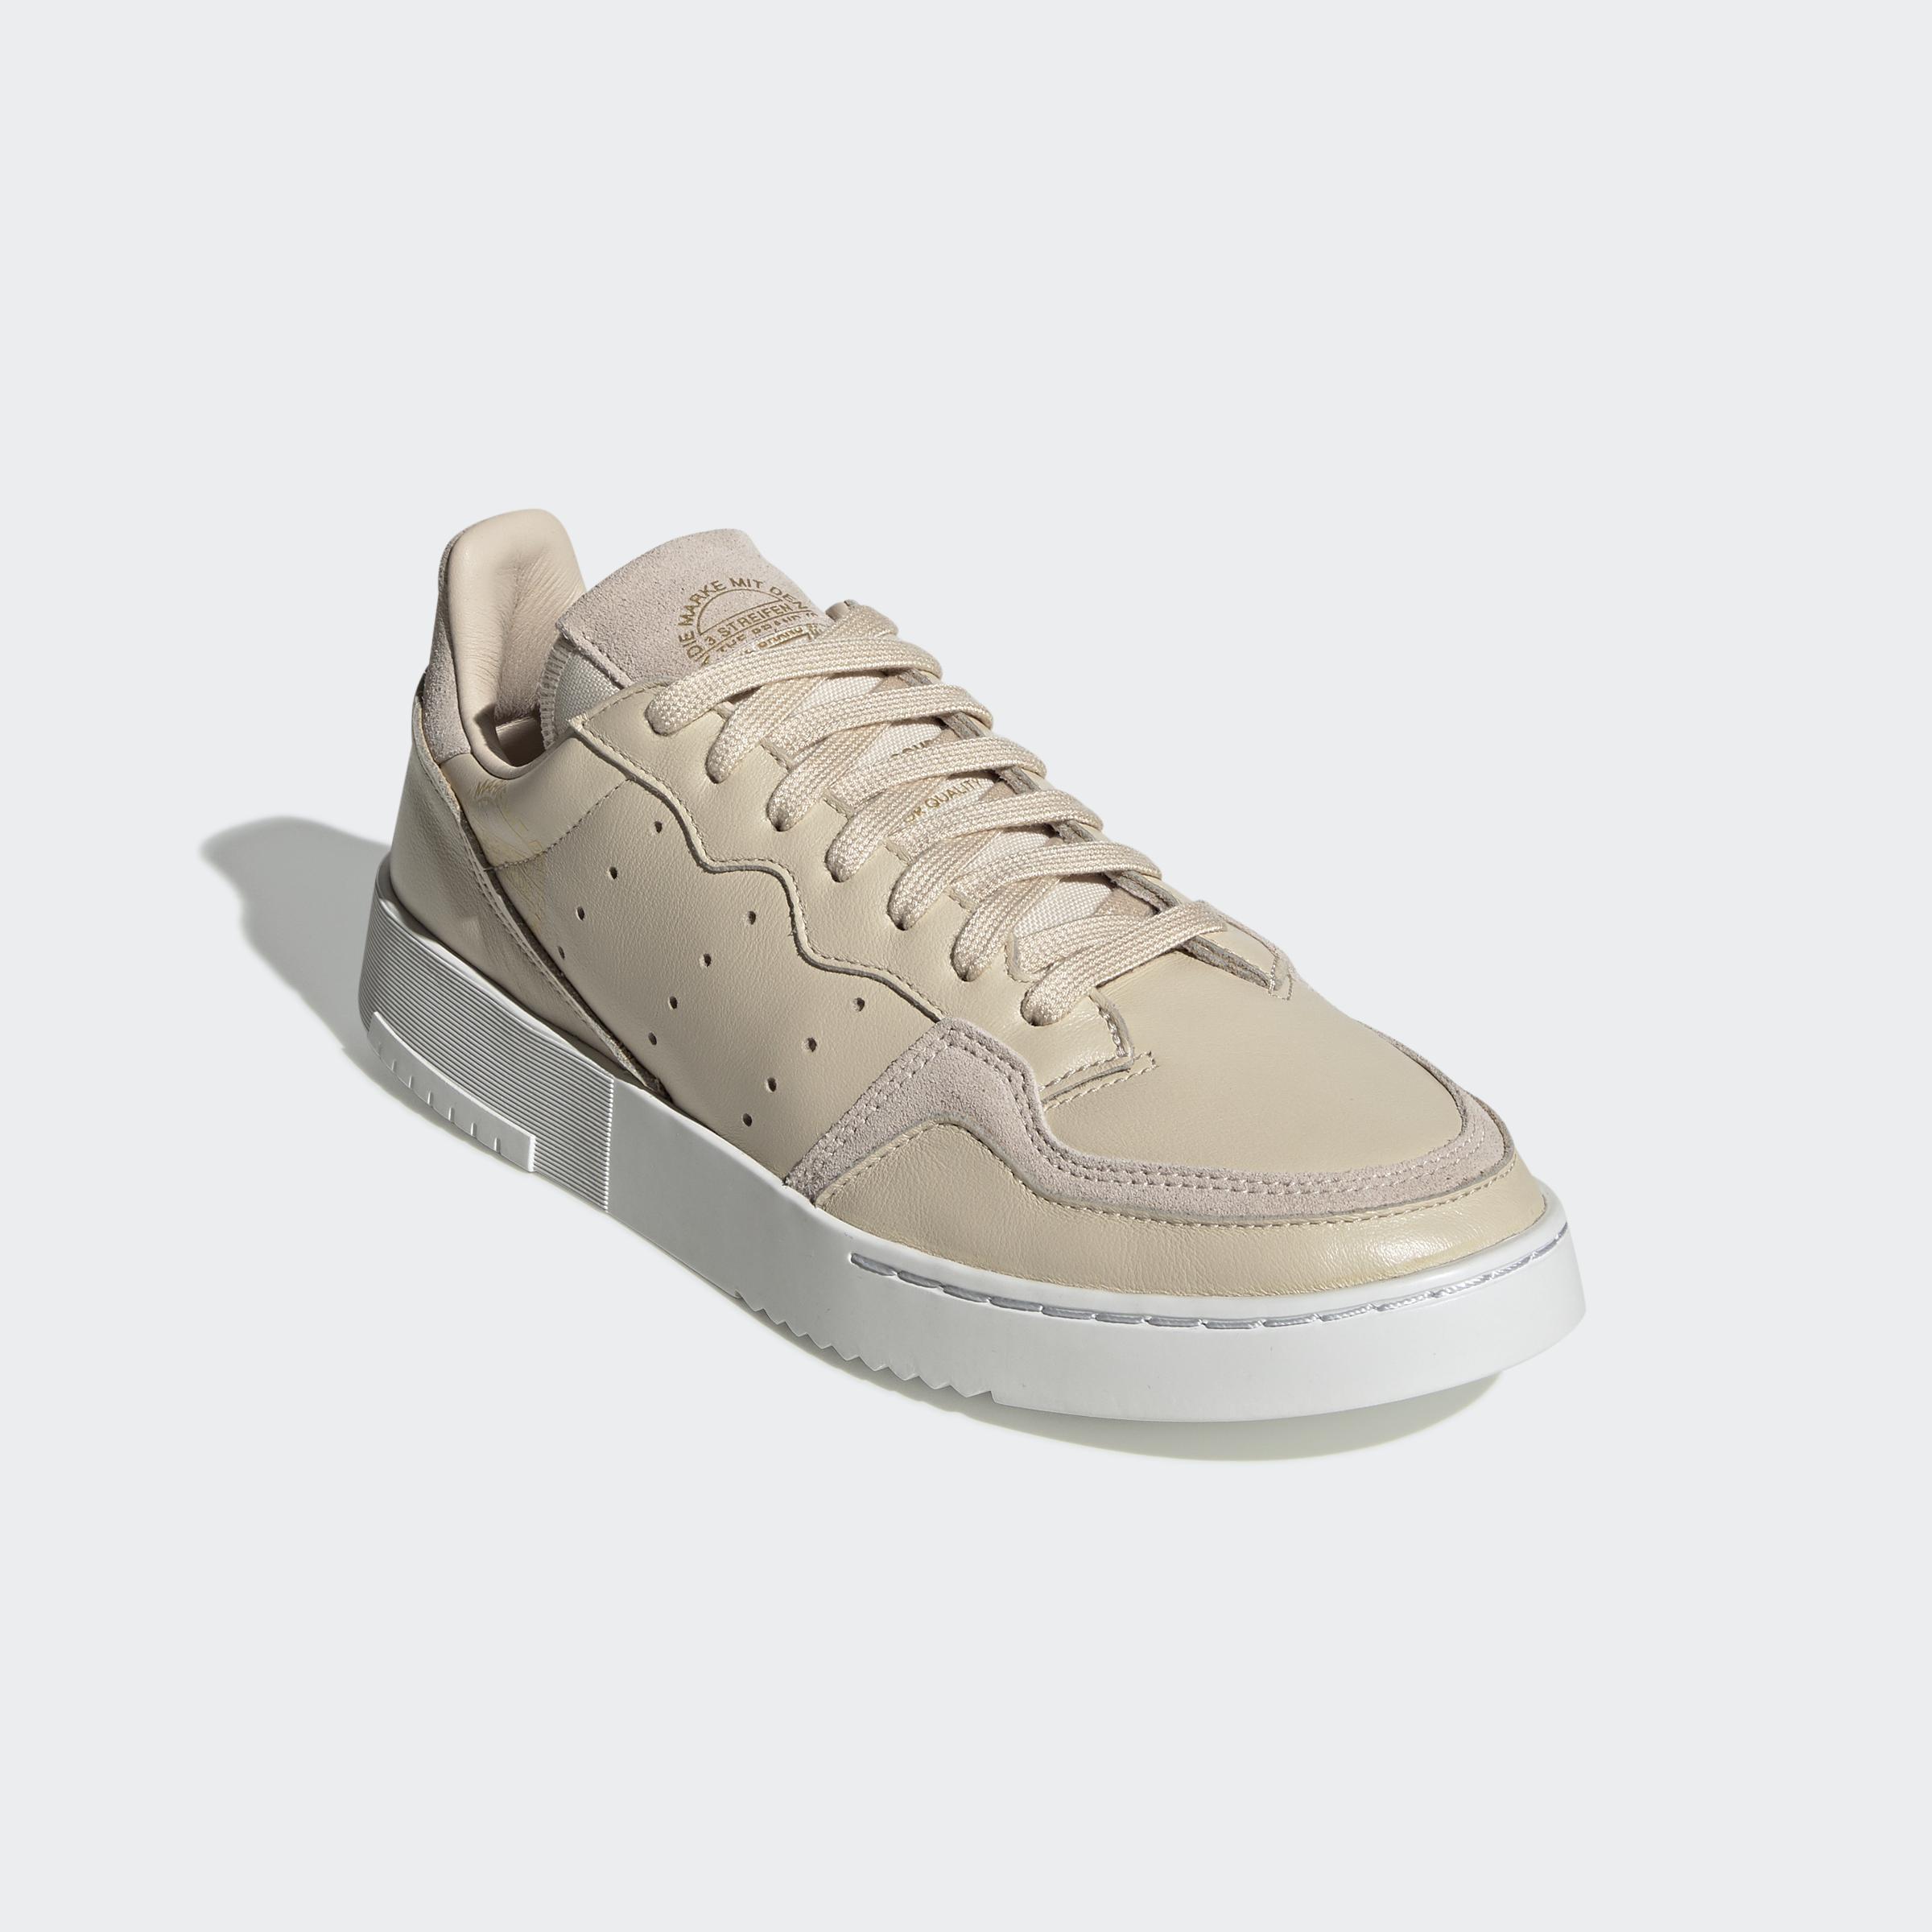 Indexbild 7 - adidas Originals Supercourt Schuh Herren, Damen Sneakers Turnschuhe  Freizeit